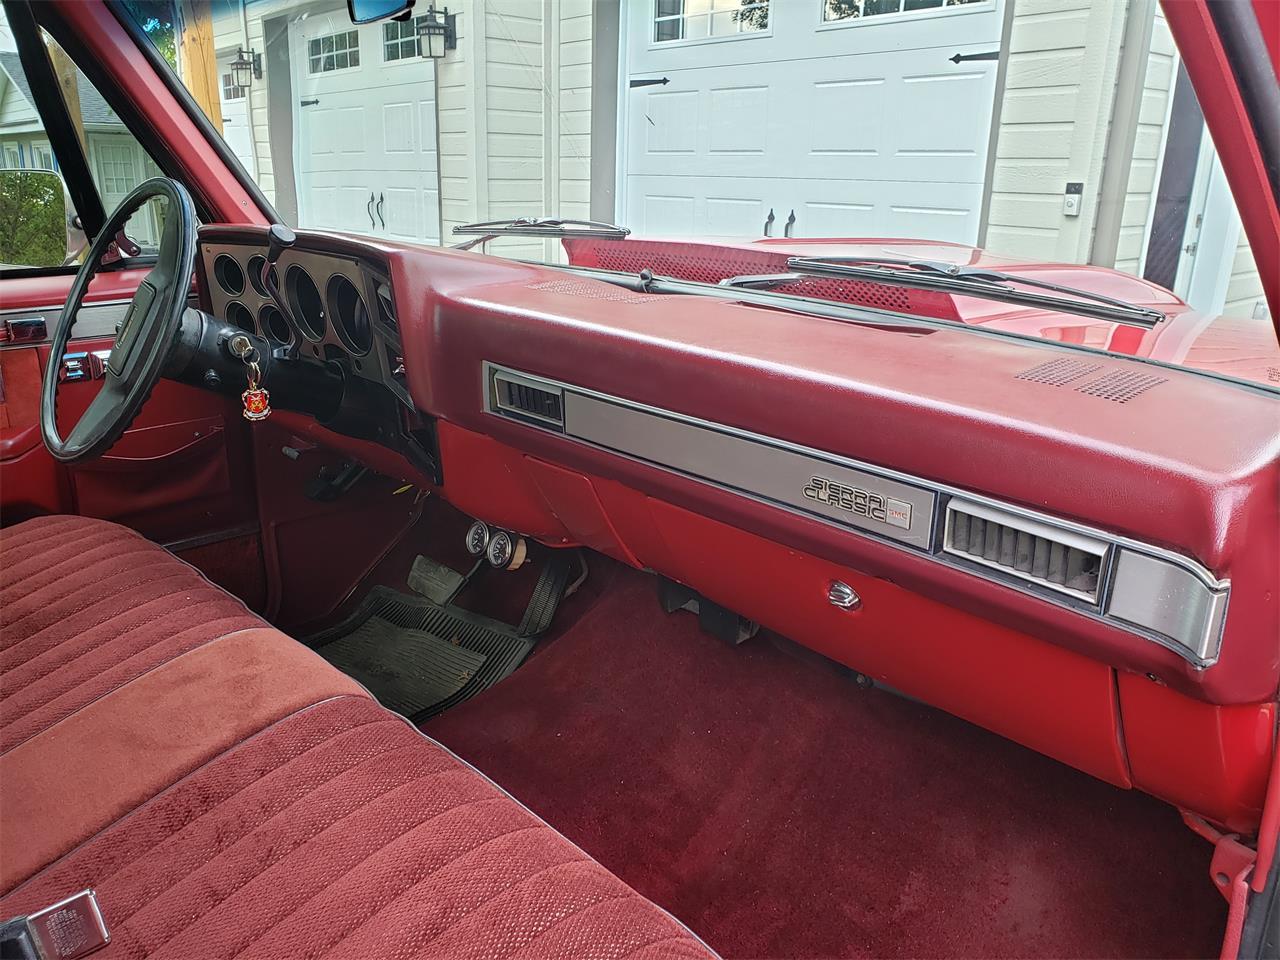 1986 GMC Sierra (CC-1369629) for sale in Port rowan, Ontario